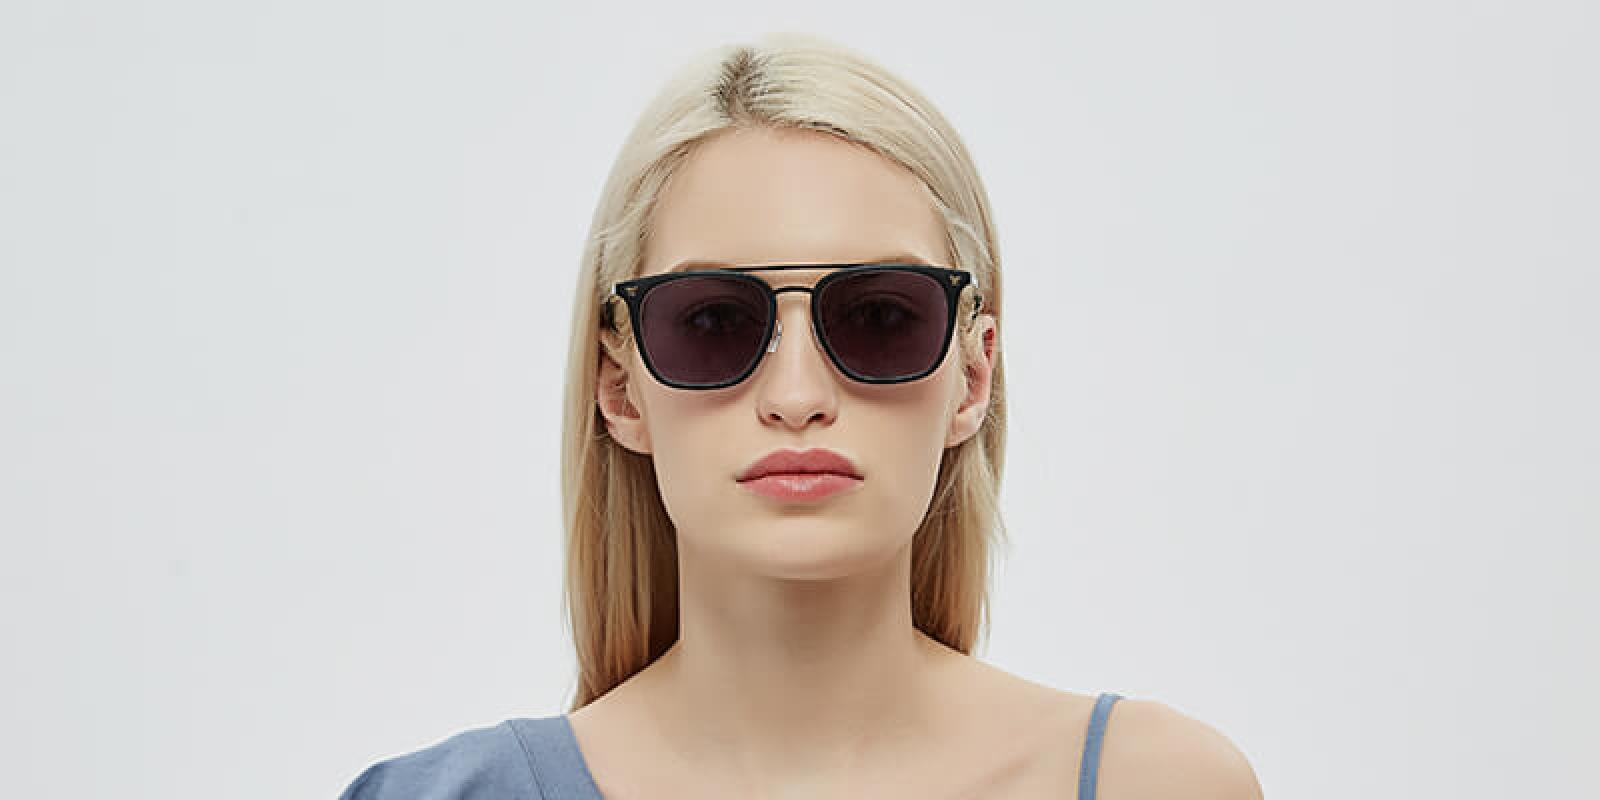 Seagual-Black-Combination / Metal / TR-Sunglasses-detail1